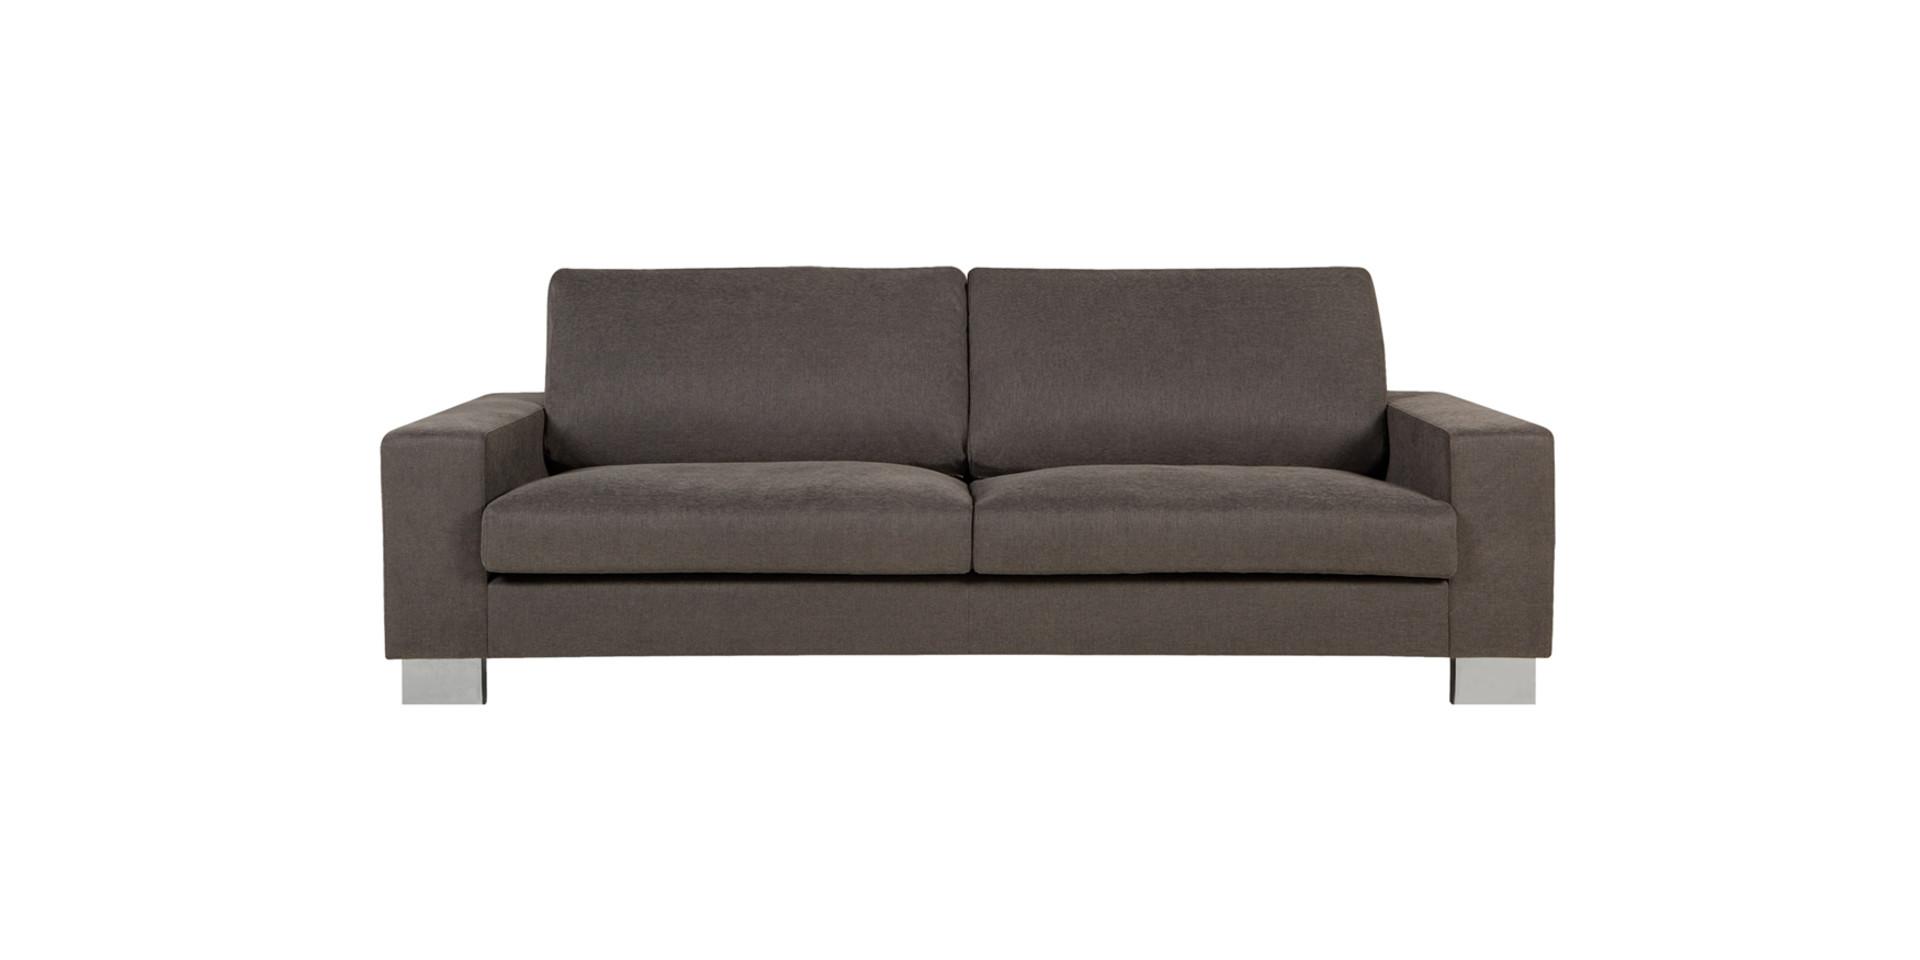 sits-quattro-canape-3seater90_drom54_grey_1